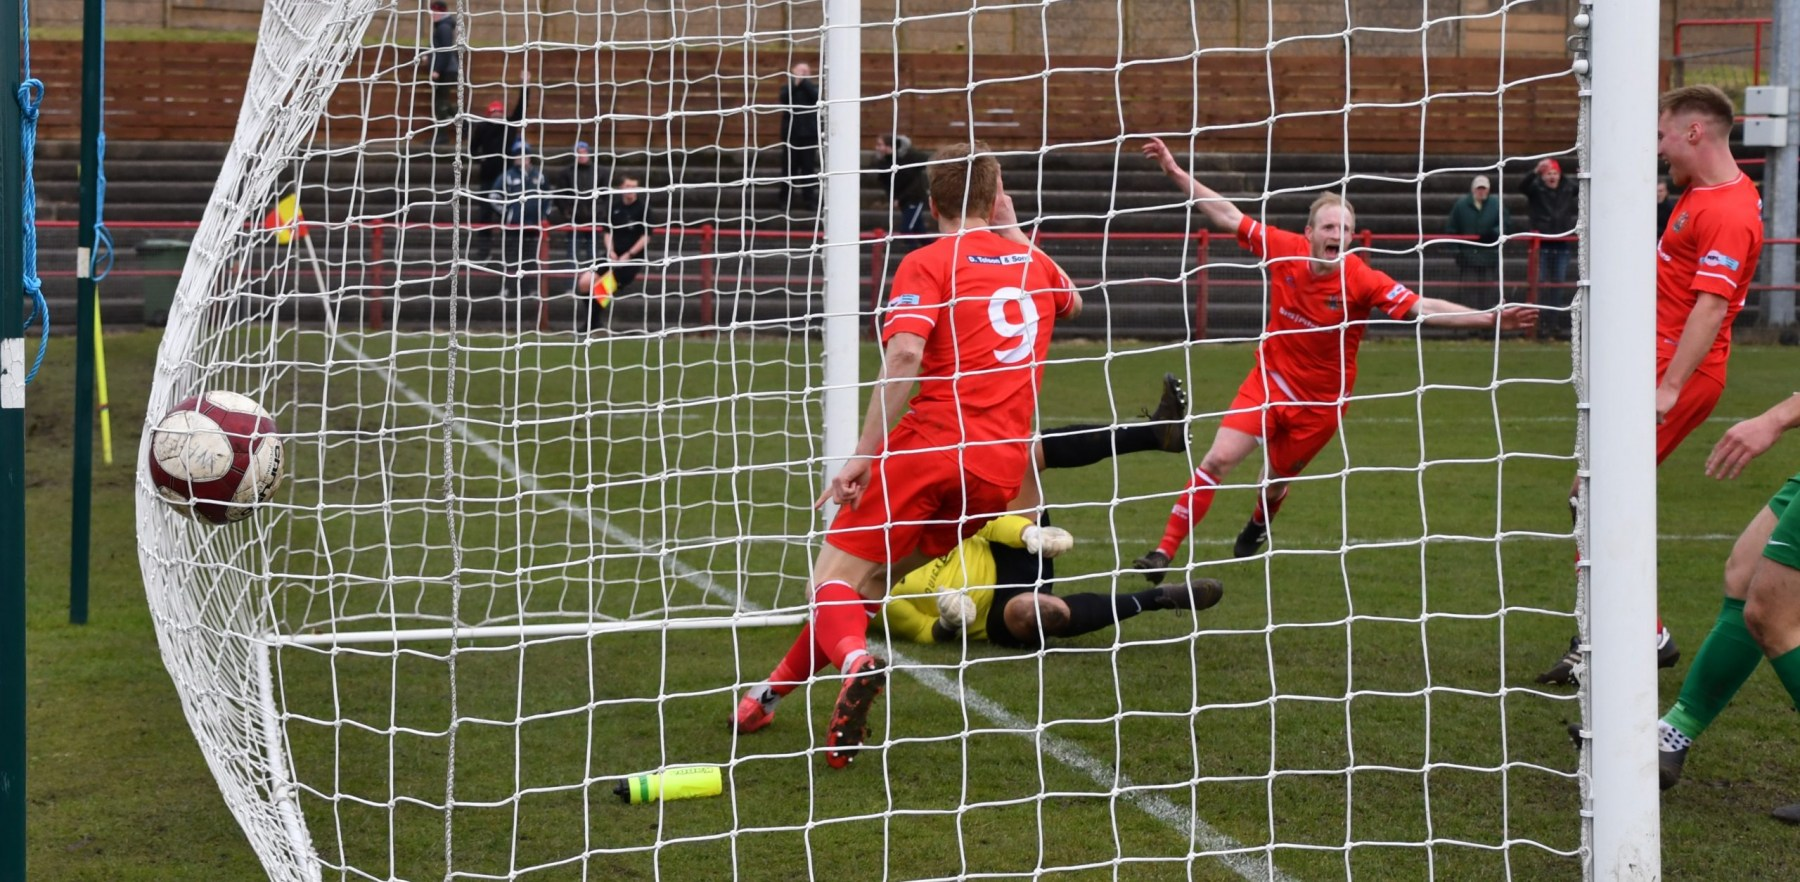 Dav-Symingtons-extraordinary-free-kick-hits-home-for-Workington-Reds-Ben-Challis-scaled